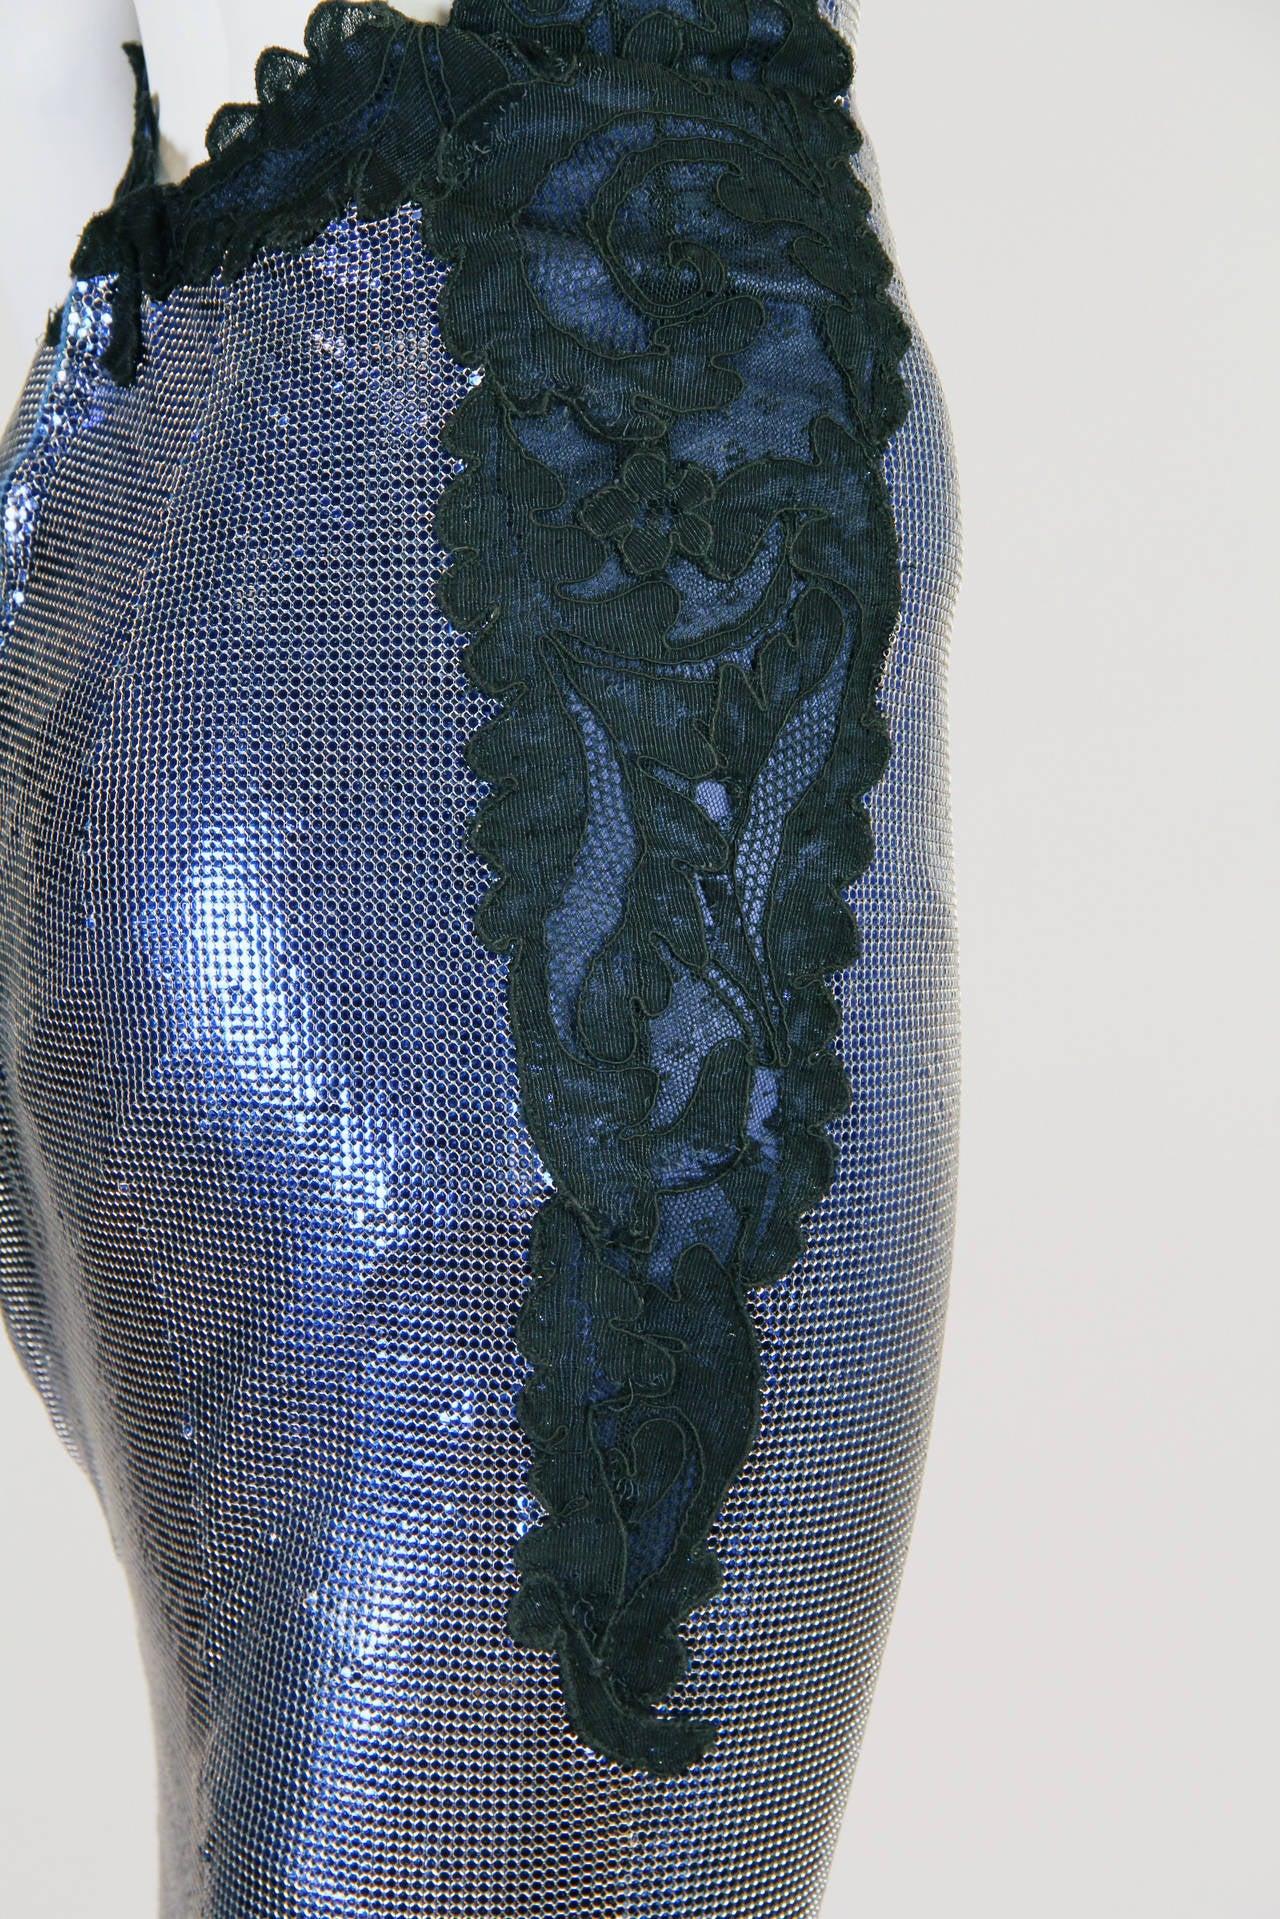 1994/6 Versace Couture Metal Mesh Lingerie Evening Dress 9